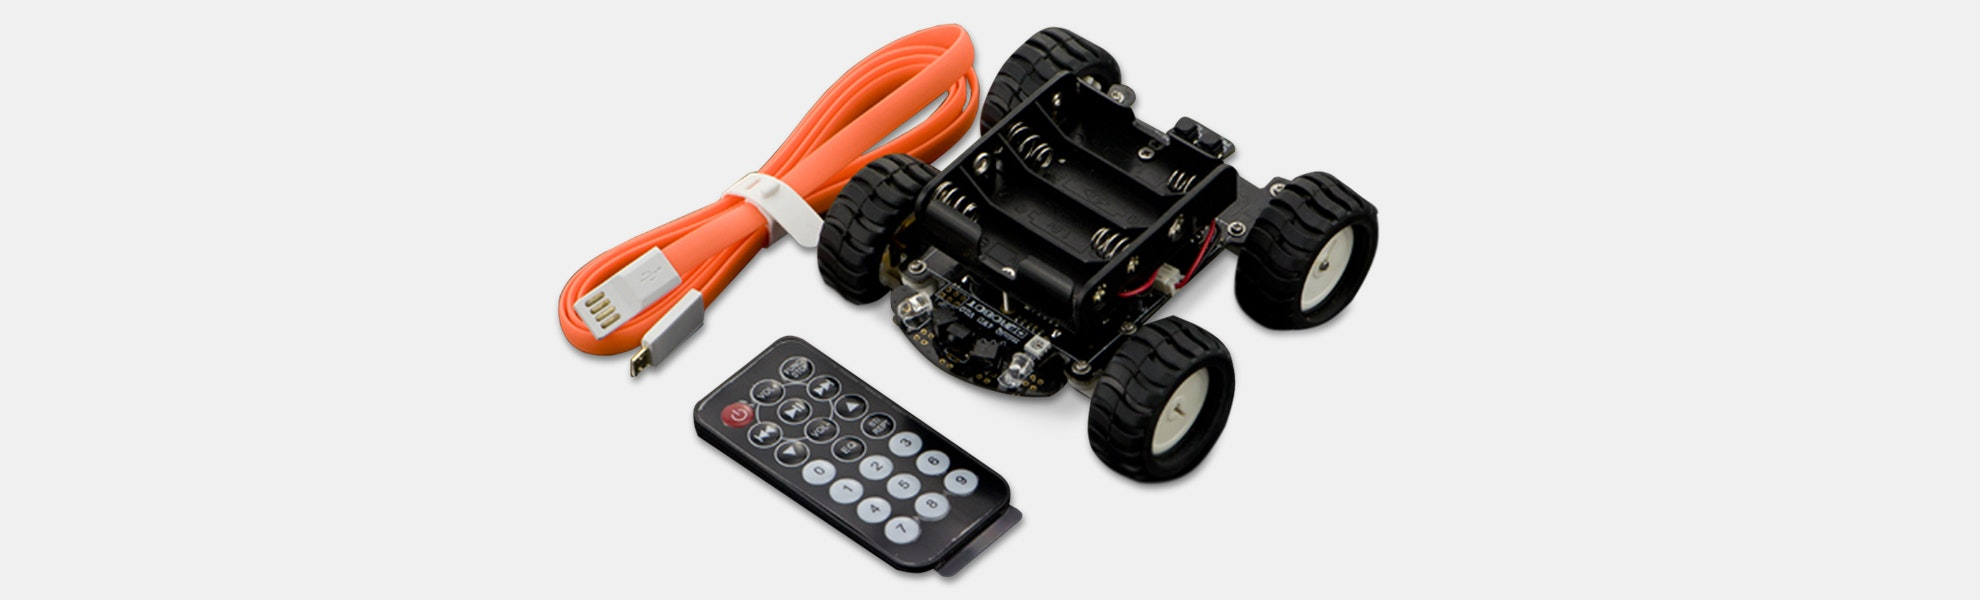 DFRobot MiniQ 4WD Cross Country Arduino Robot